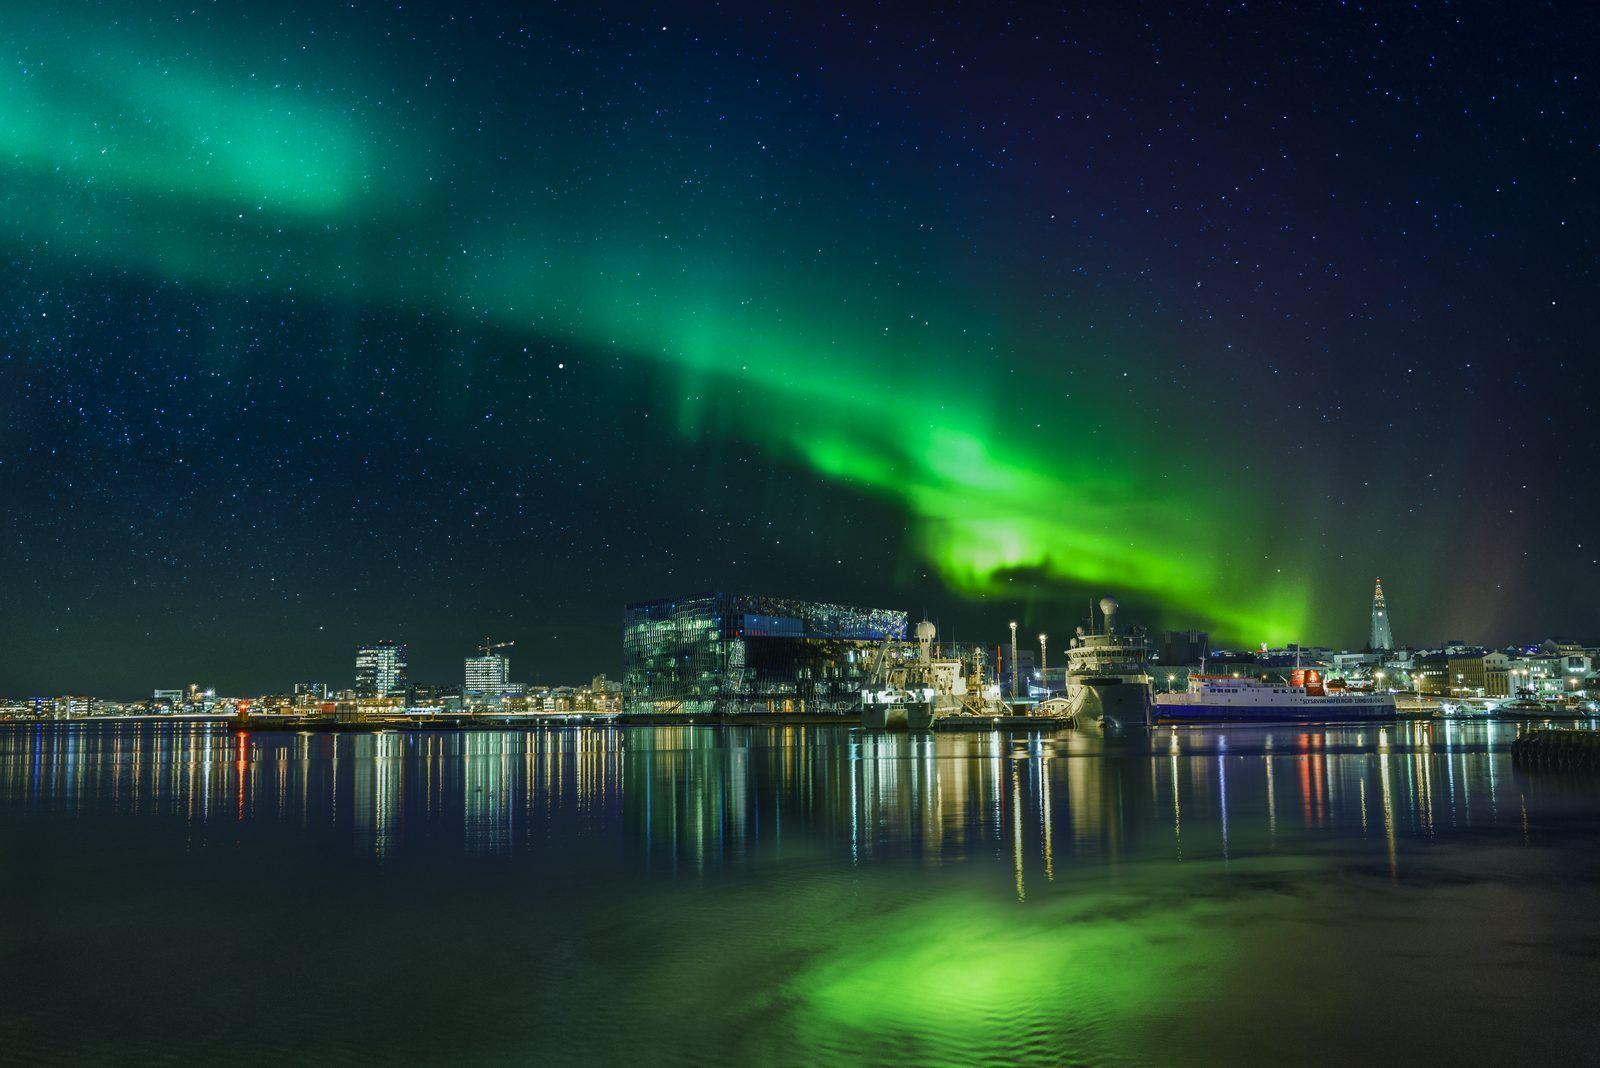 Aurora borealis over Hapra concert music hall in downtown Reykjavik